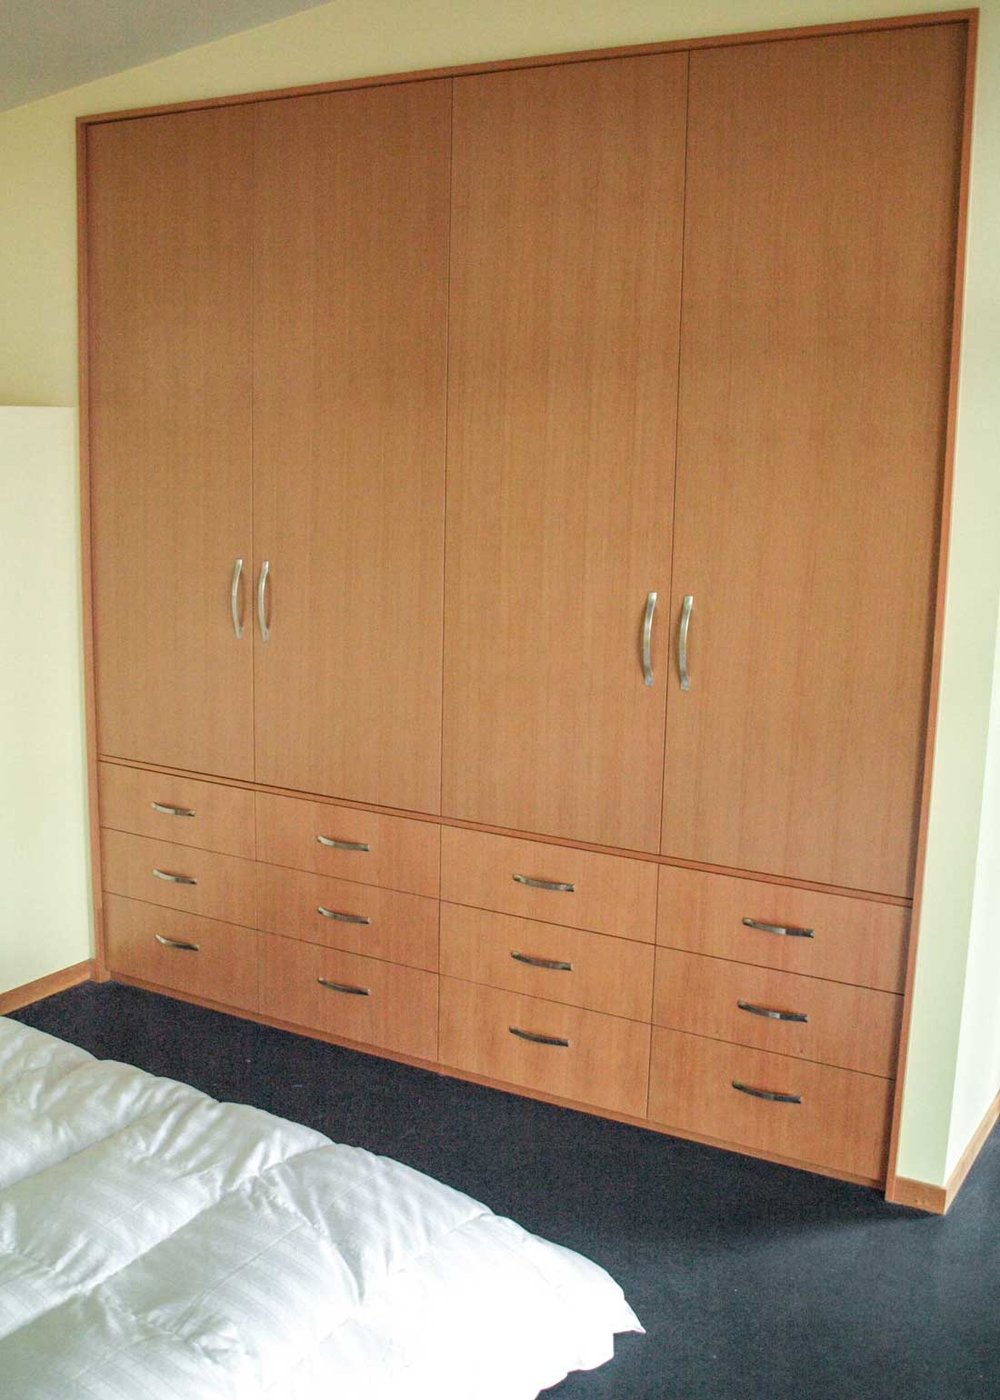 cabinets-9.jpg